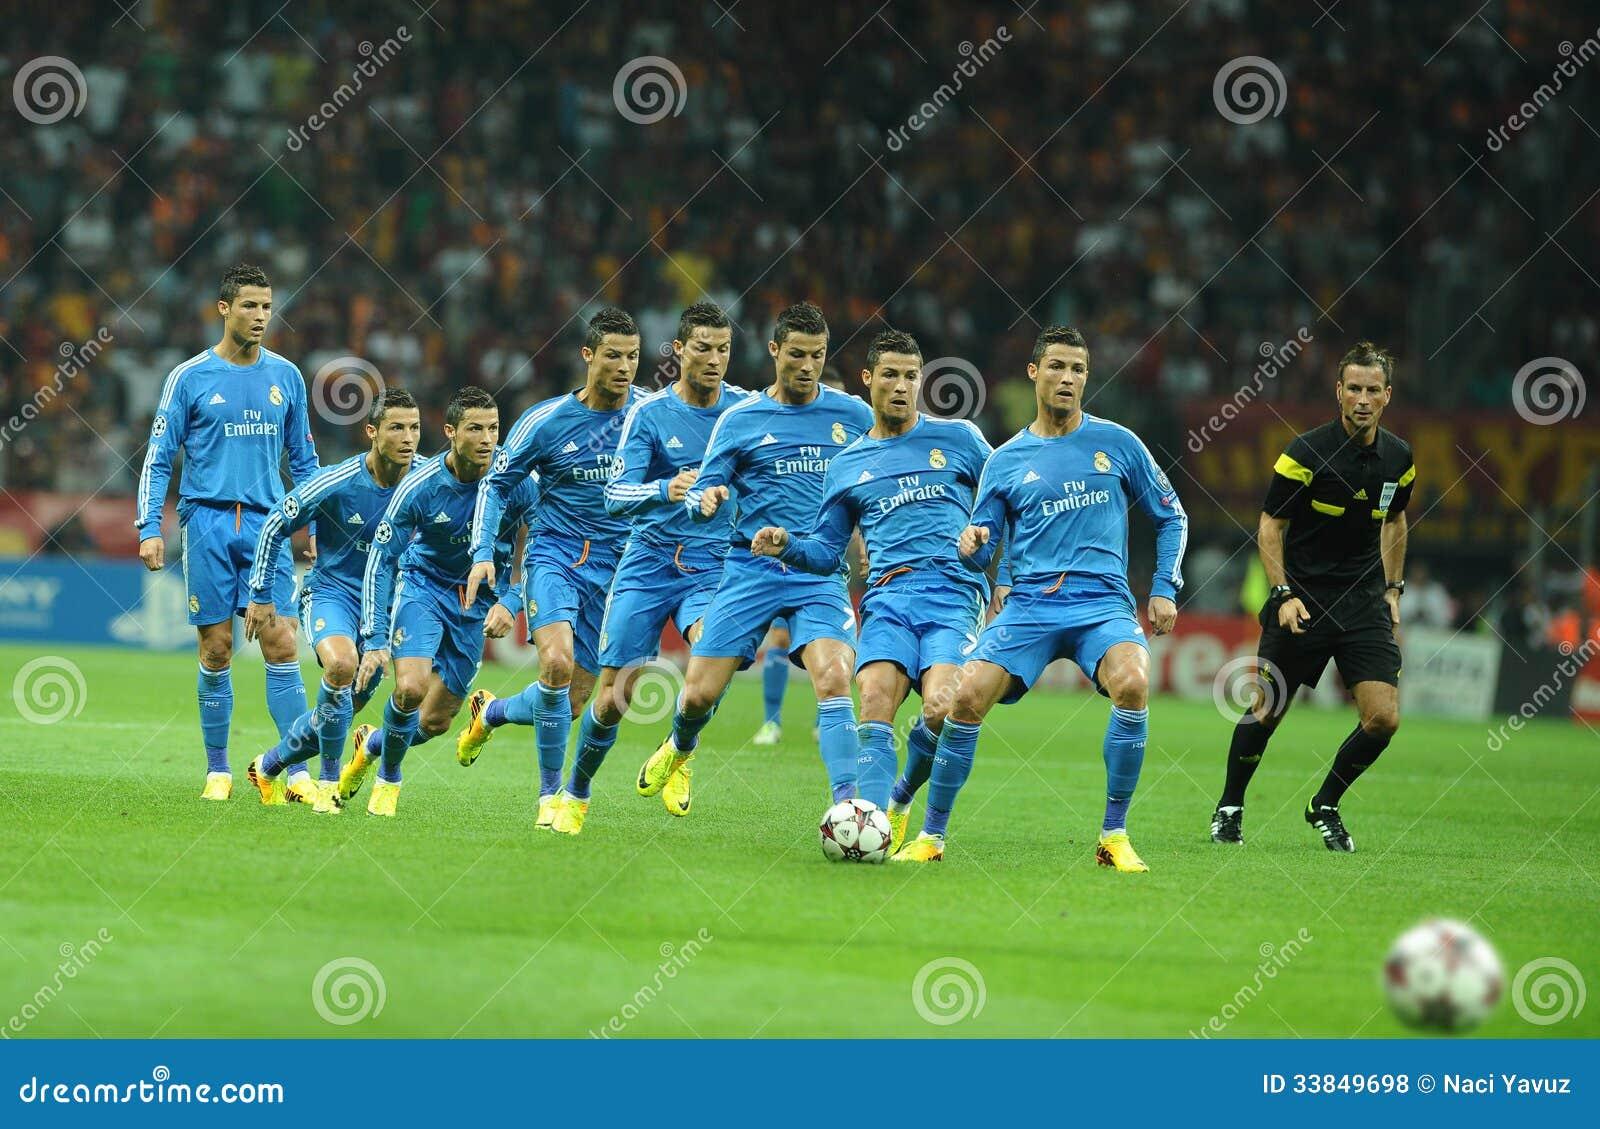 Cristiano Ronaldo Kick Ball Stock Images Download 107 Royalty Free